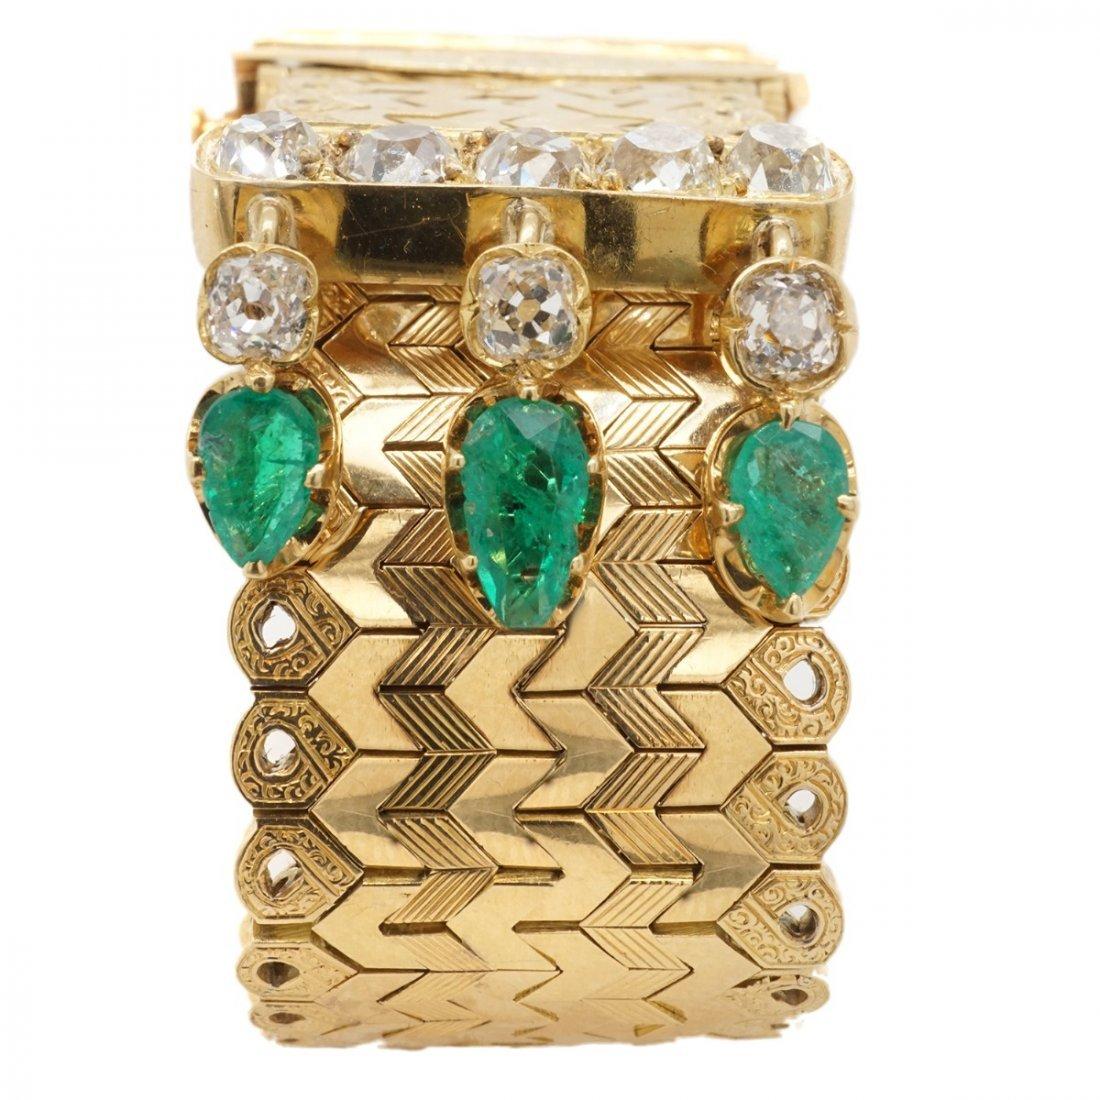 FRENCH EMERALD DIAMOND 18 KARAT GOLD BRACELET - 8